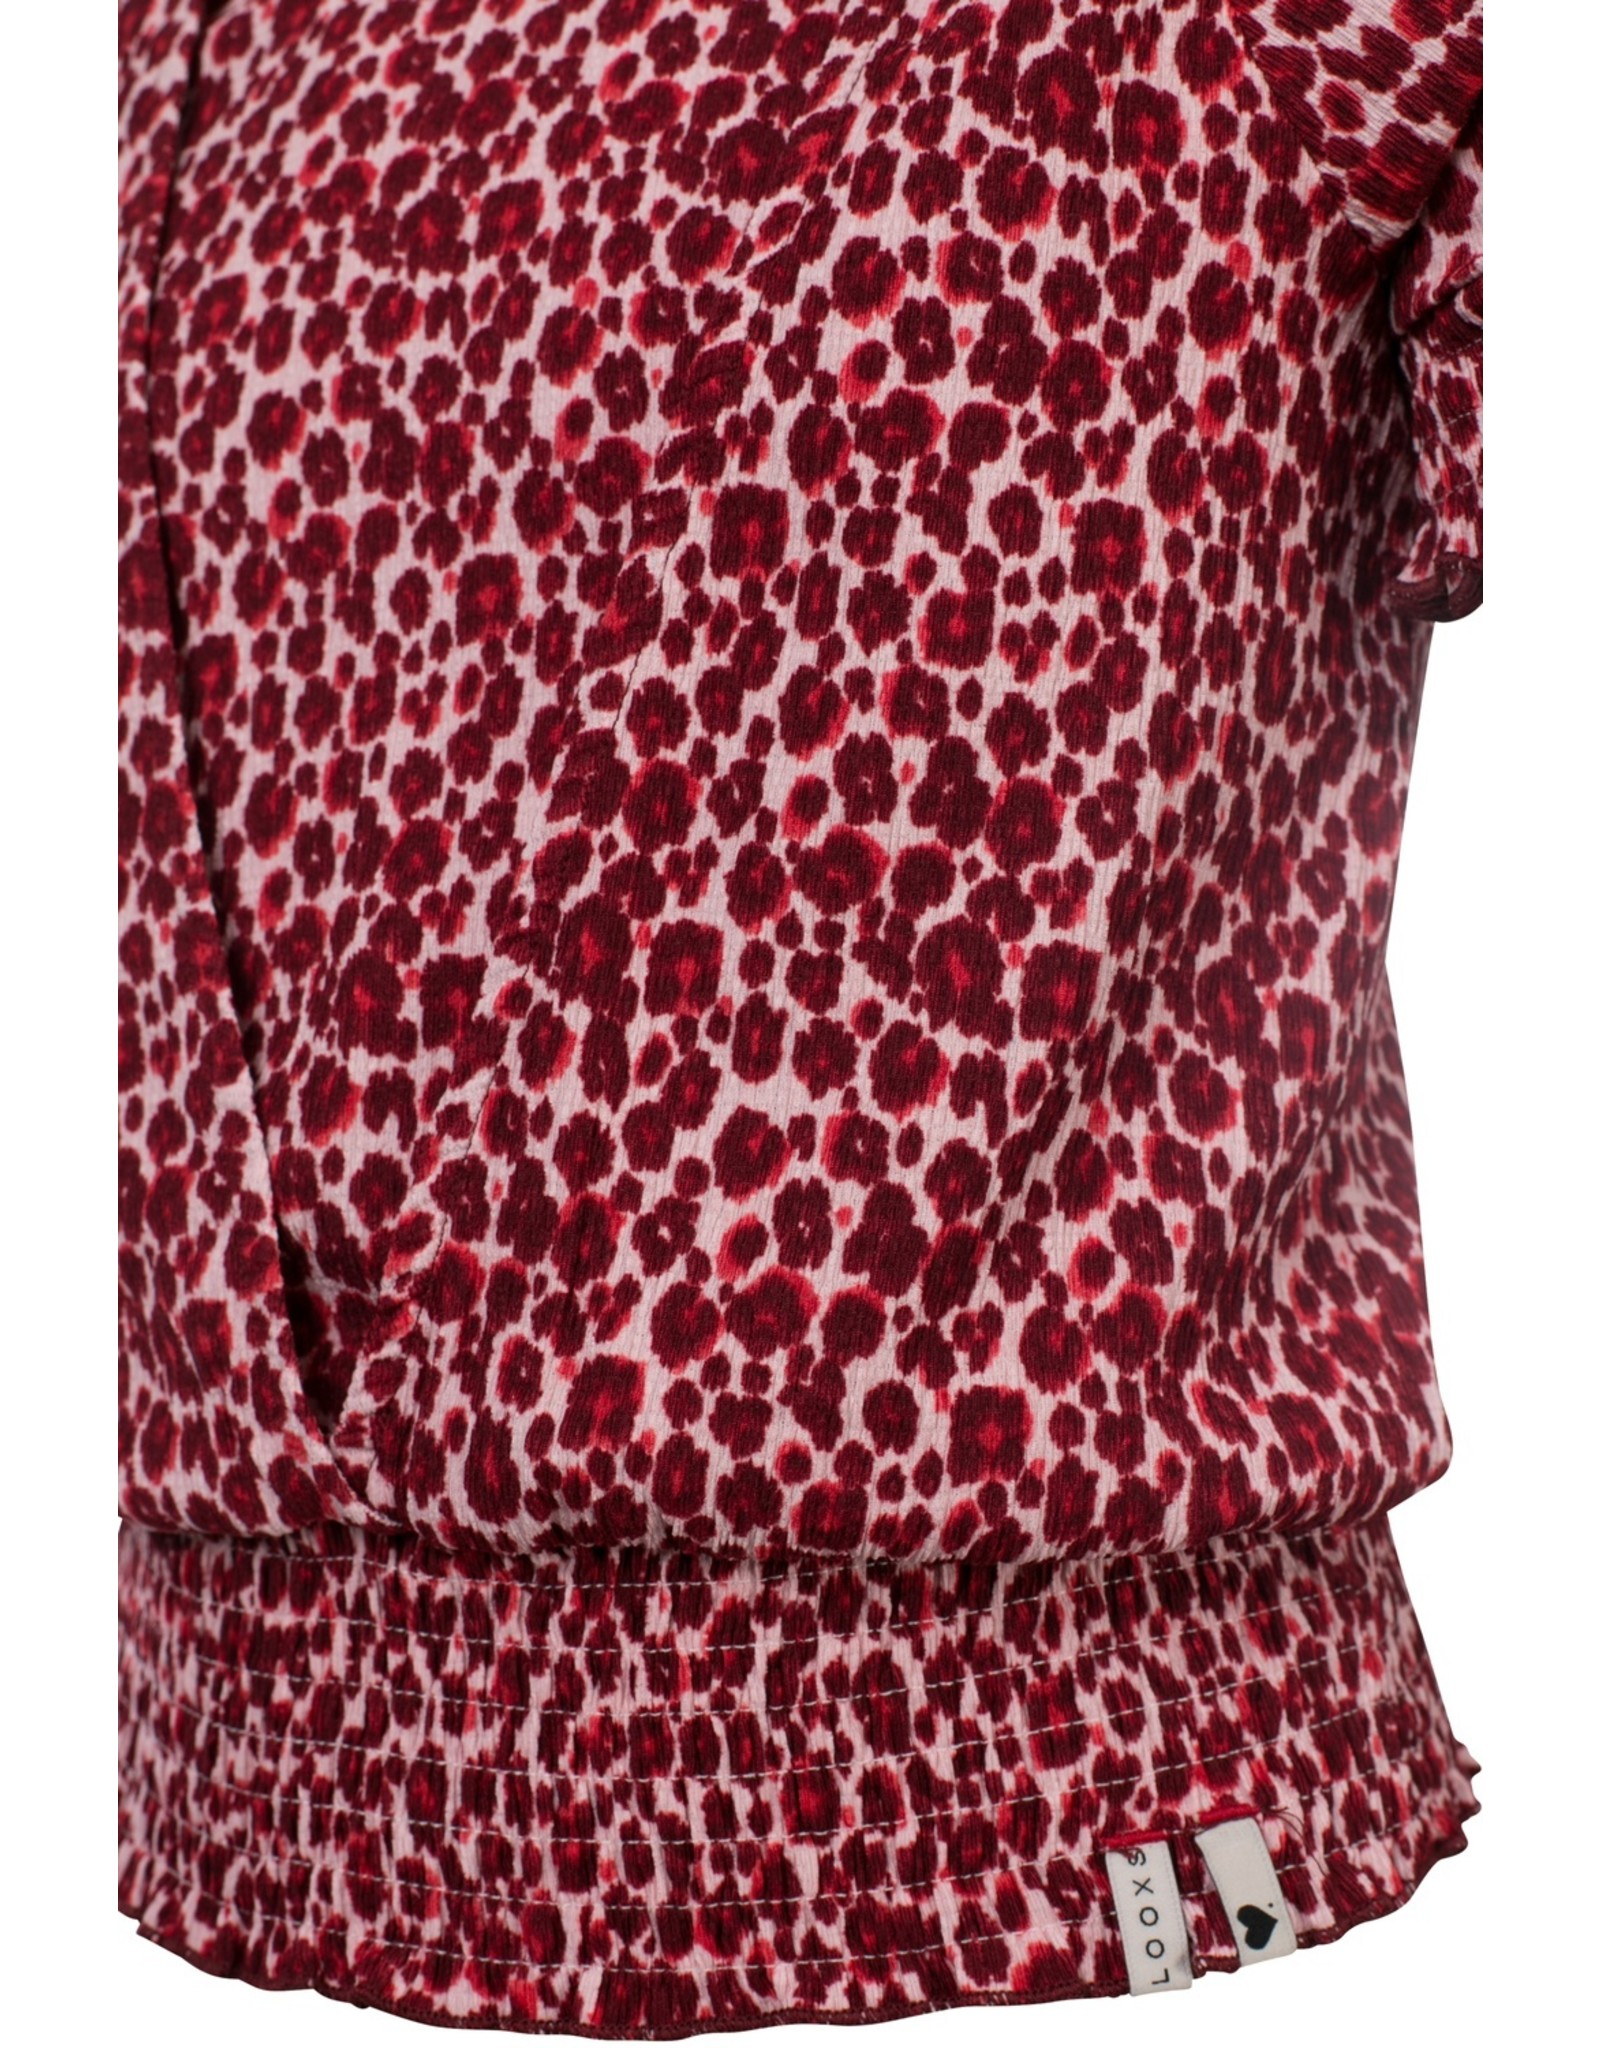 Looxs Revolution Girls woven wrap top